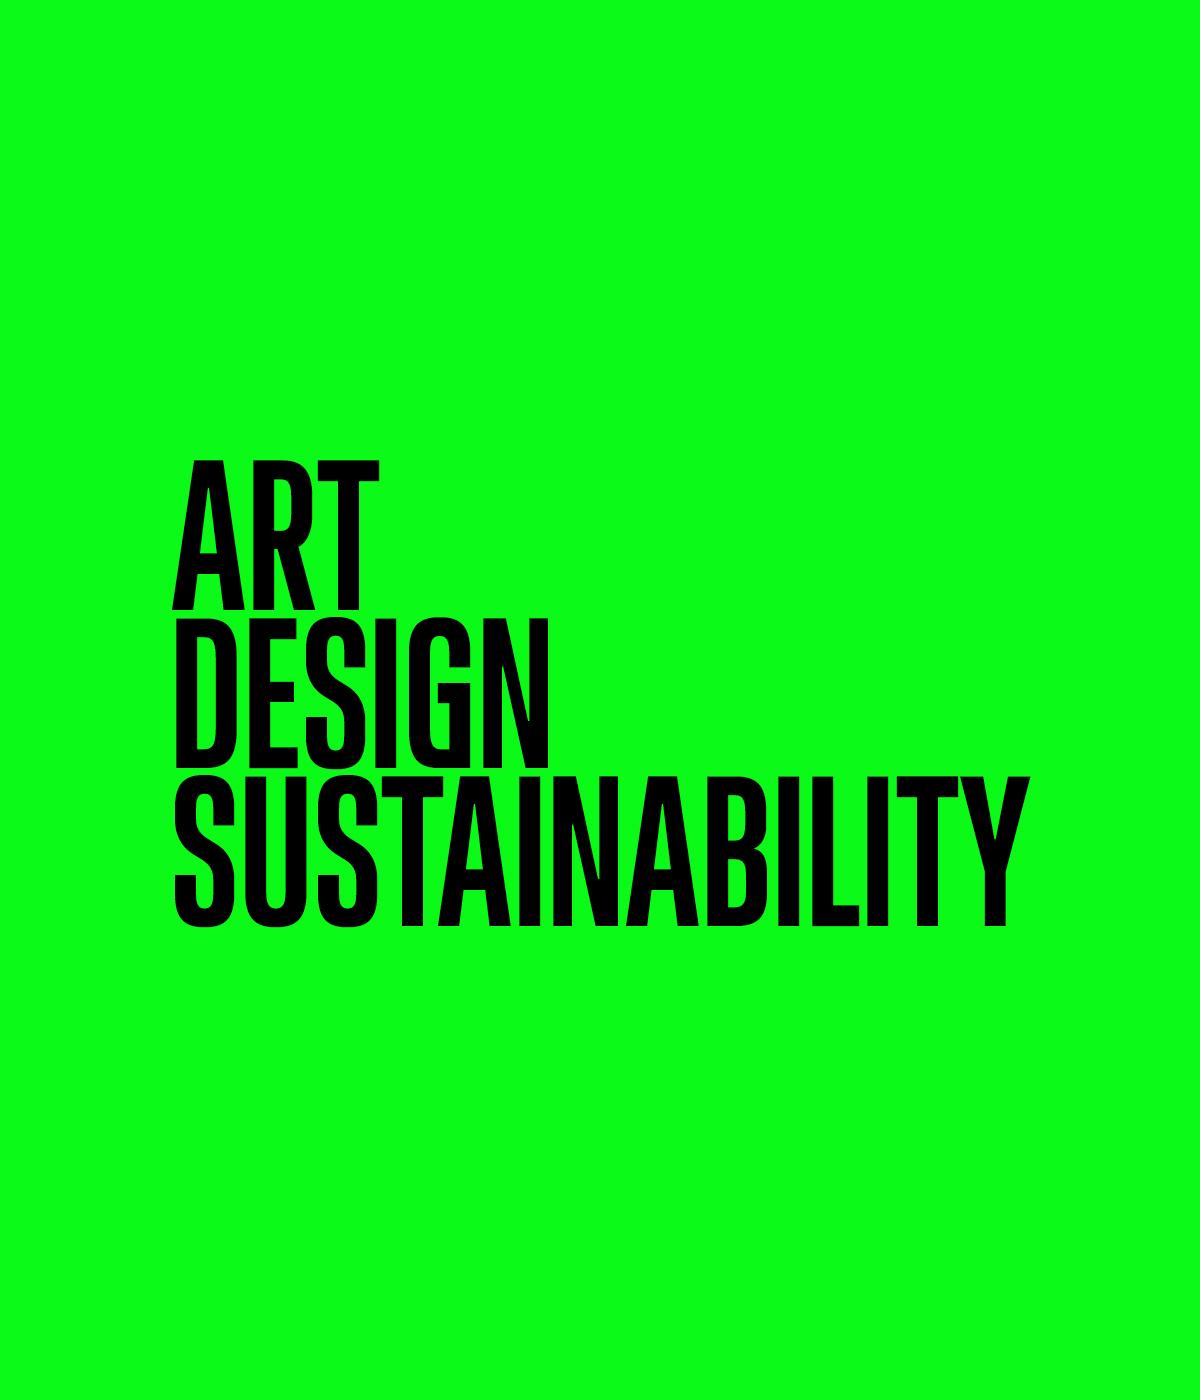 art-design-sustainability-gh